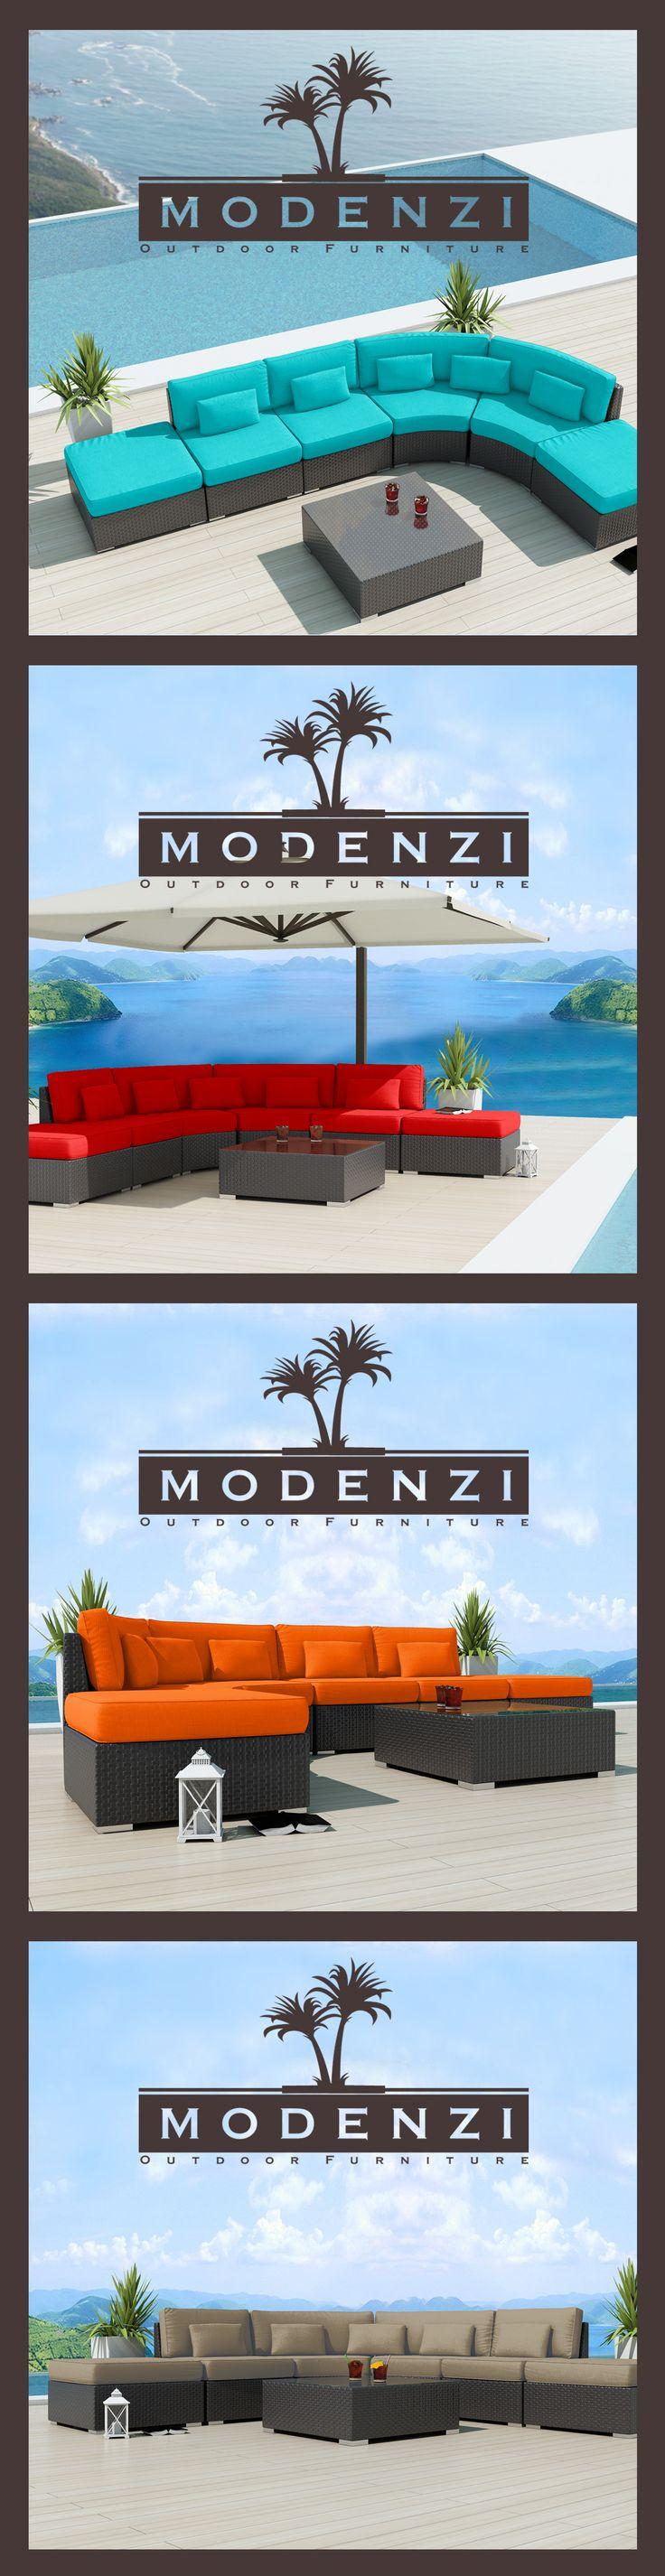 Modenzi Modern Outdoor Wicker Patio Furniture set